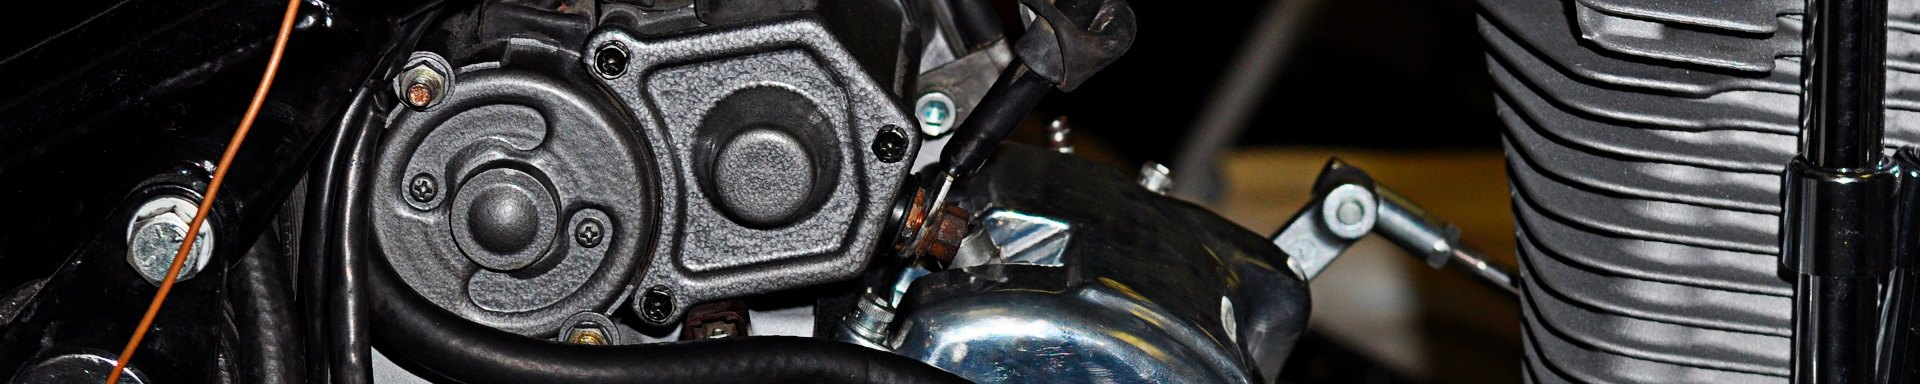 Motorcycle Starting & Charging Parts